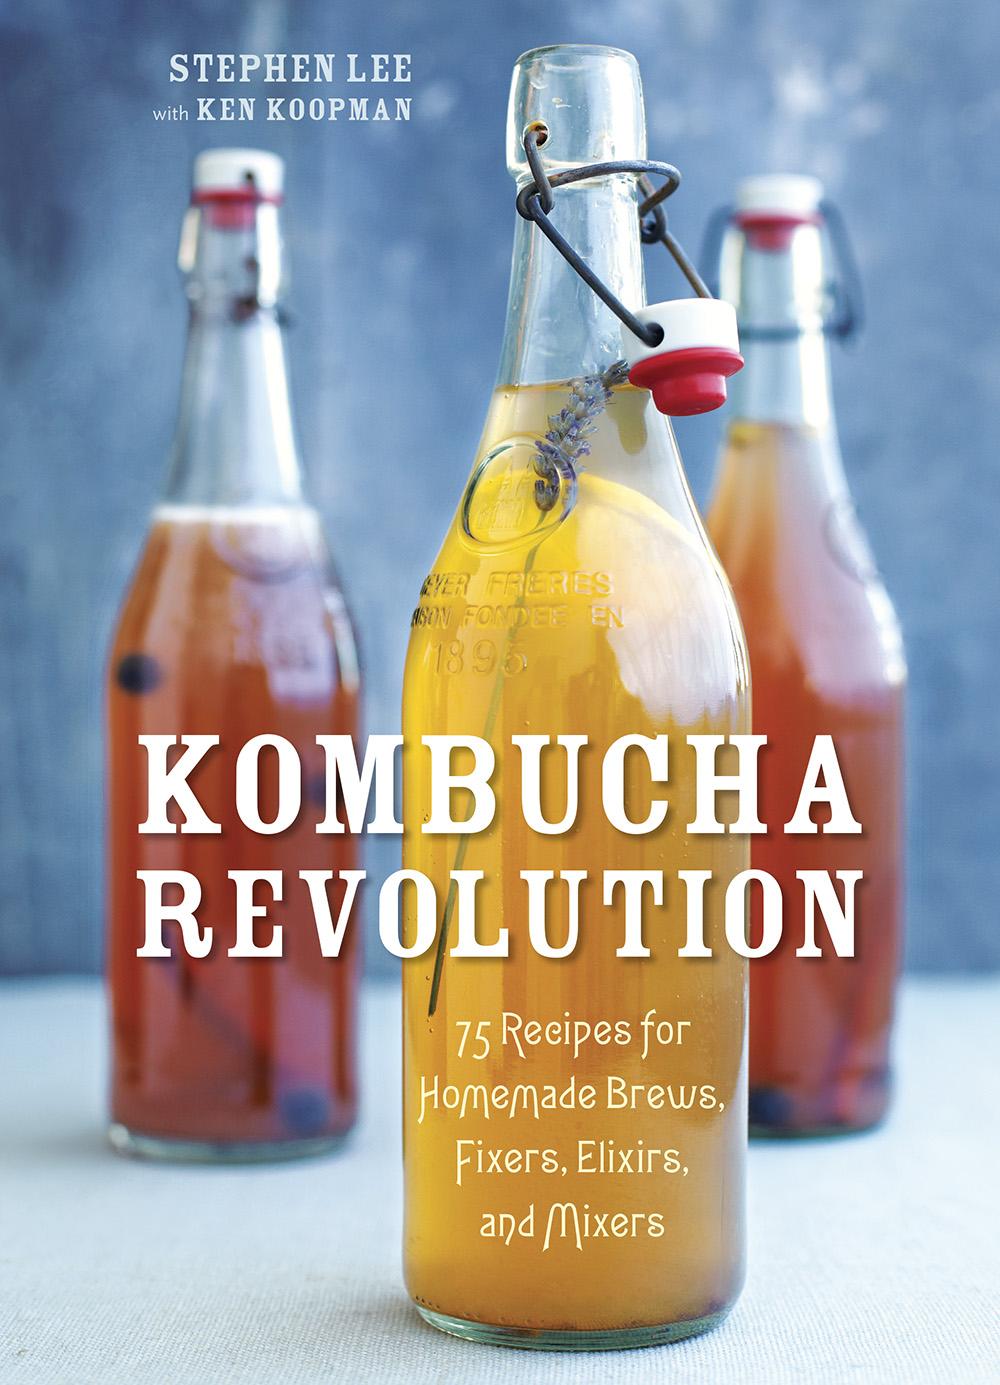 Stephen Lee/Kombucha Revolution